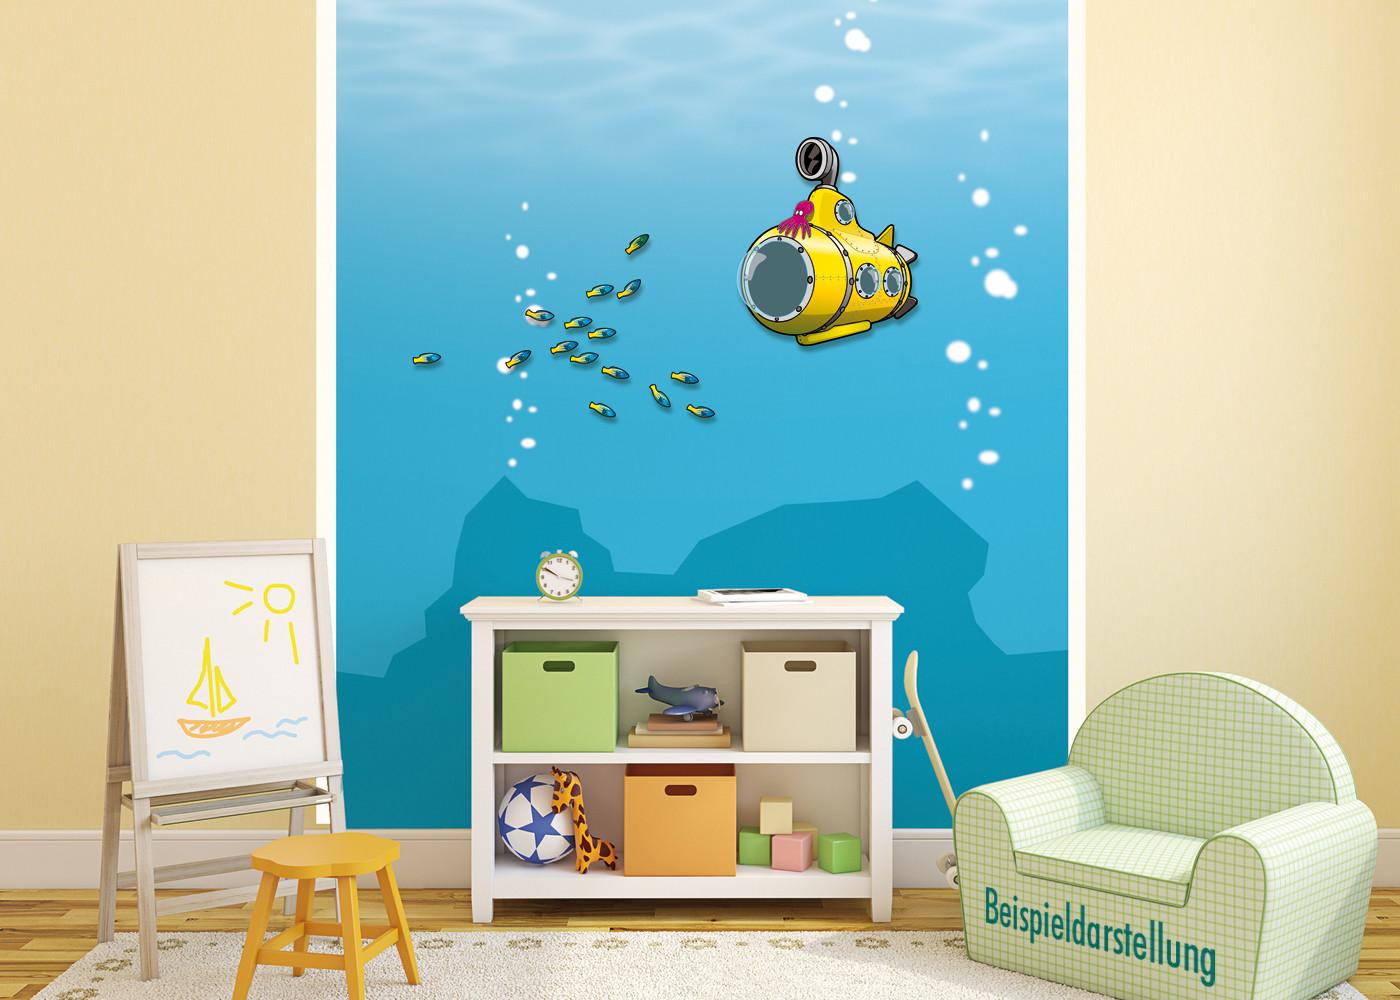 kinderzimmer gestaltung mit wandbildern himmelbaum. Black Bedroom Furniture Sets. Home Design Ideas